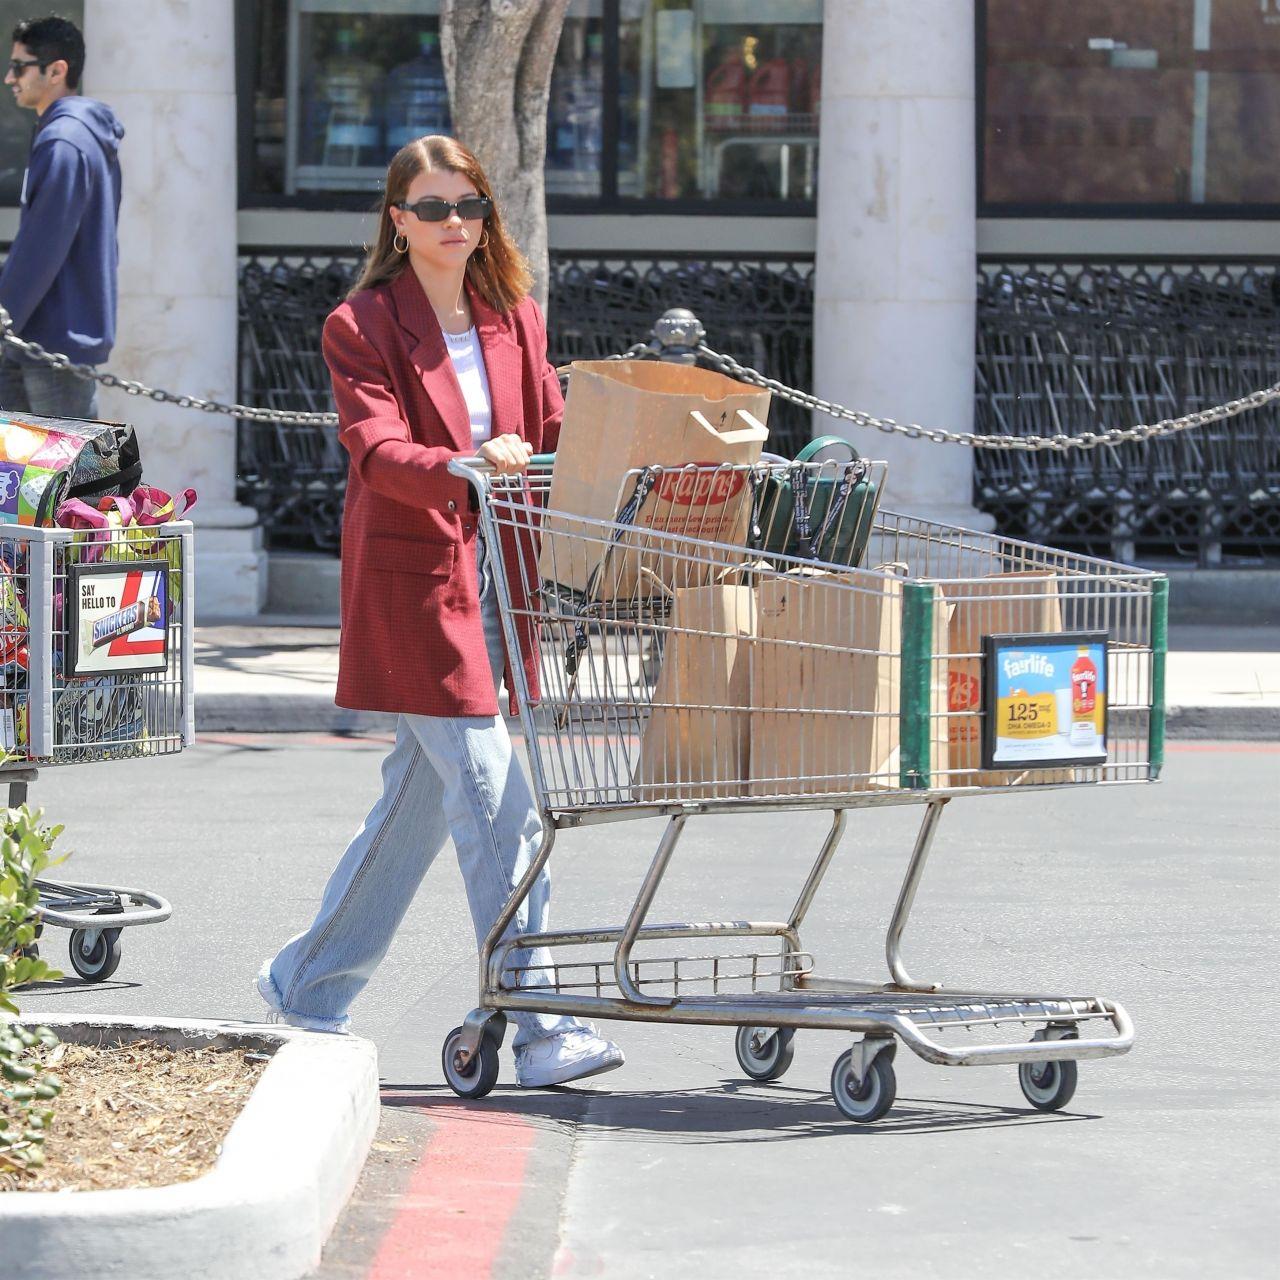 Los Angeles Supermarket: Sofia Richie Latest Photos